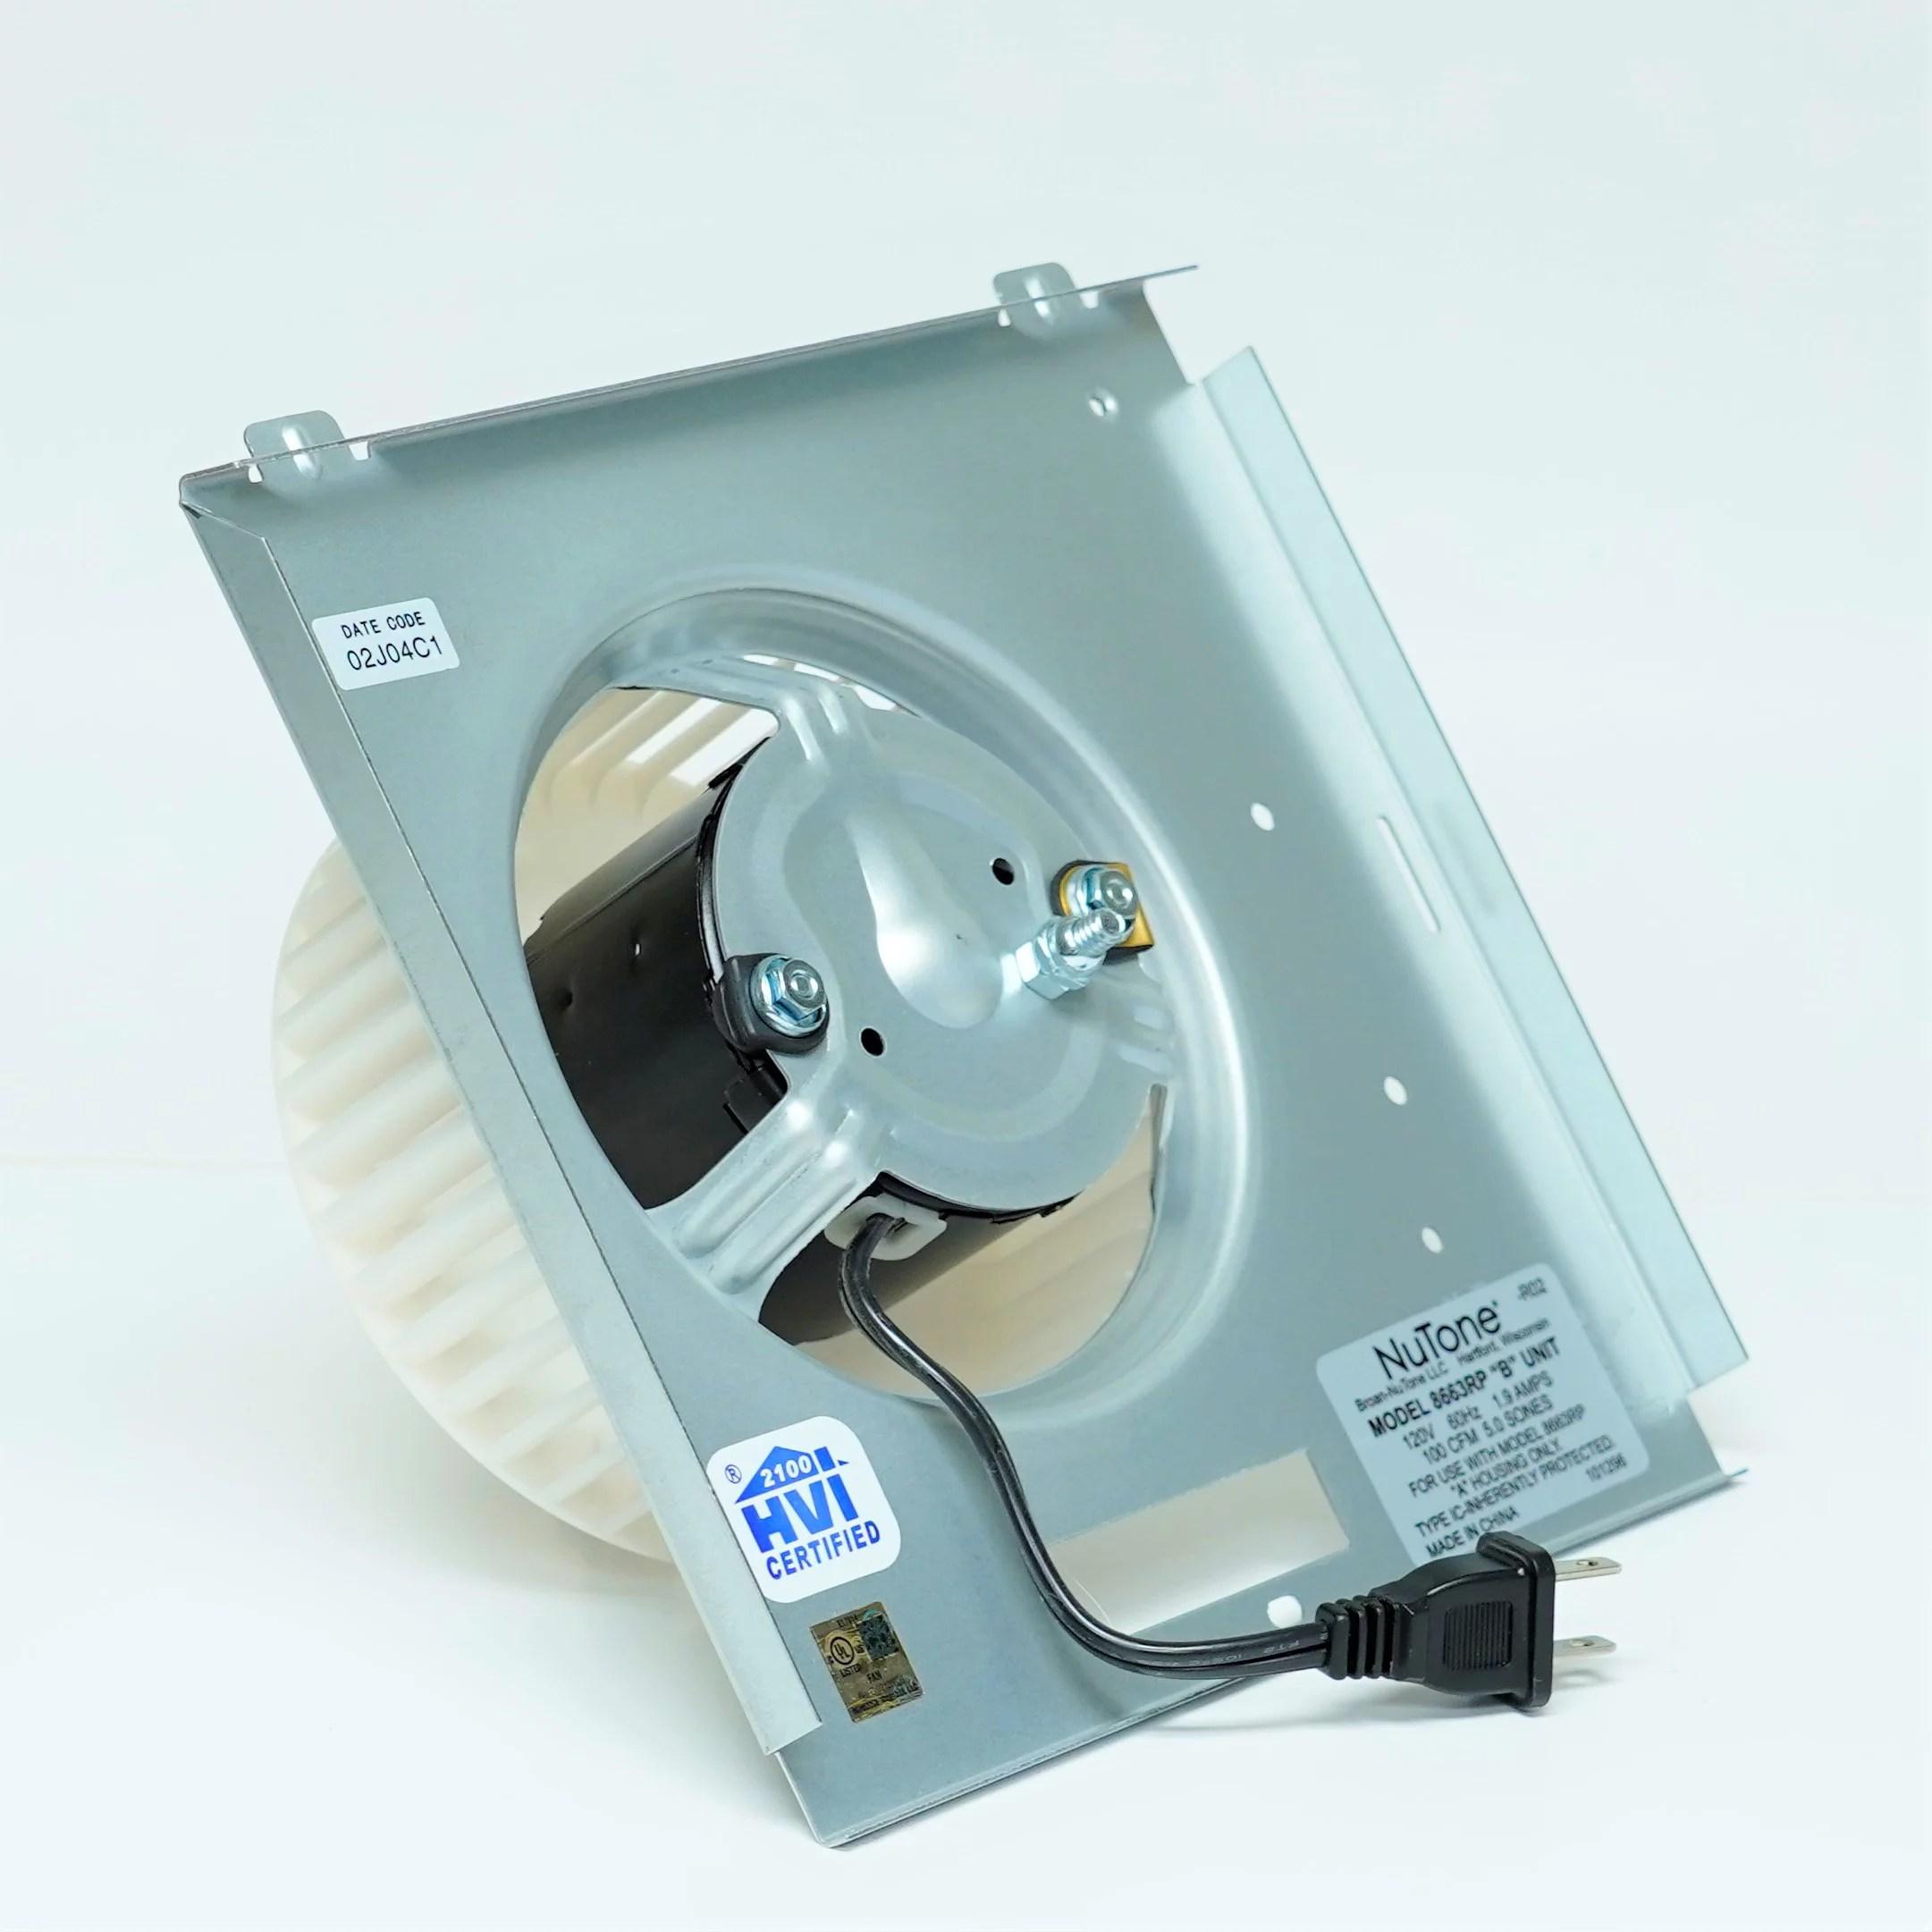 nutone motor 8663rp assembly 97017705 1550 rpm 1 2 amps 115 volts walmart com